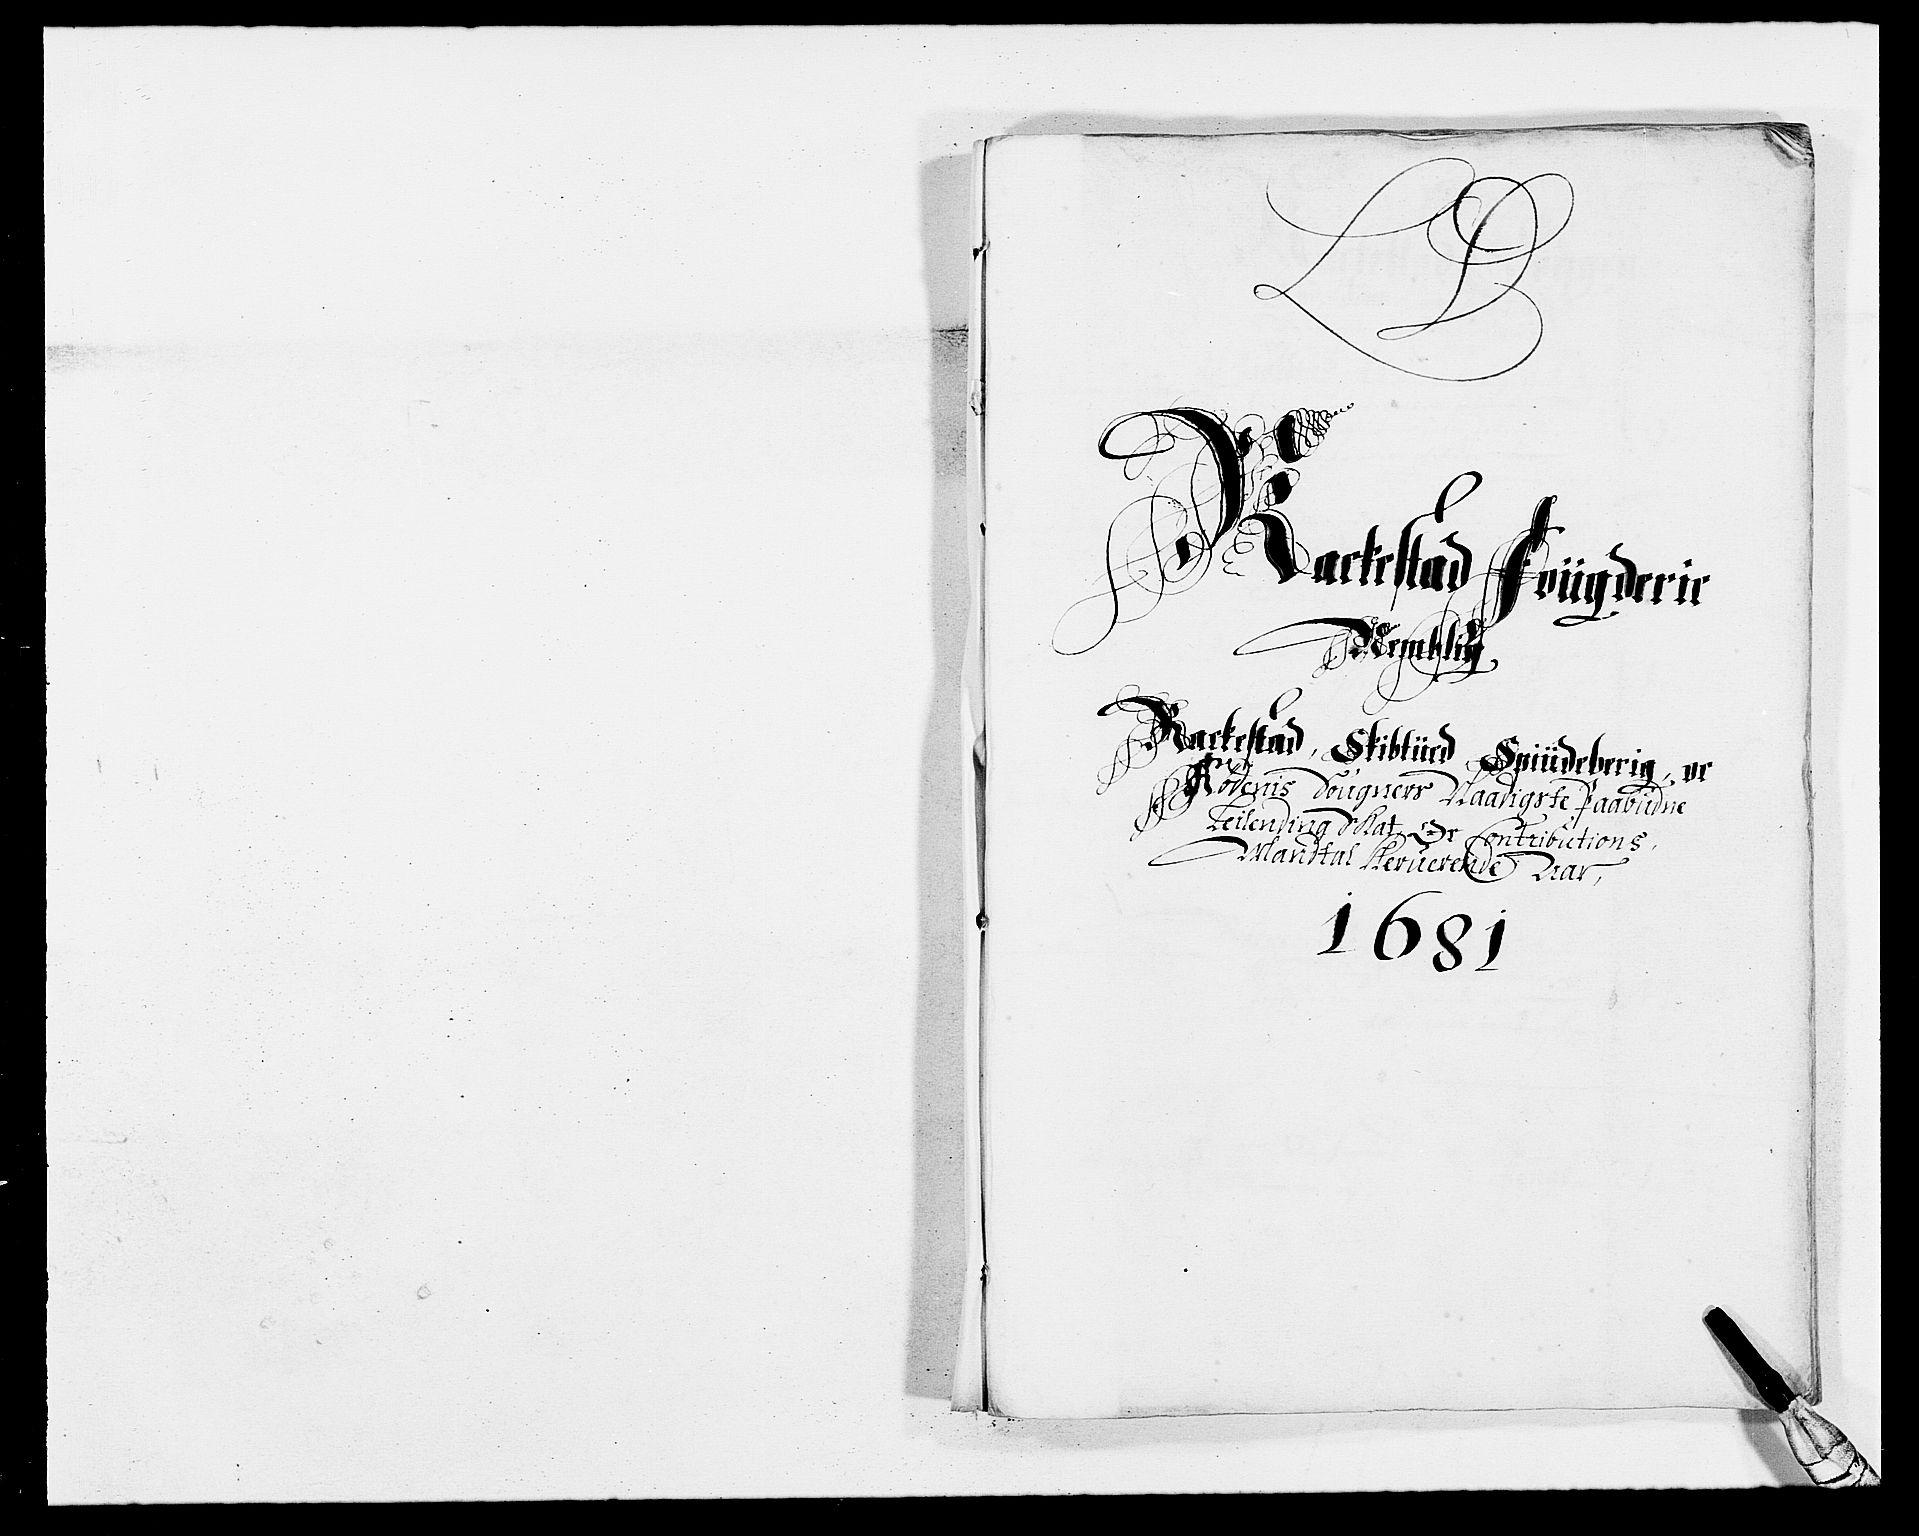 RA, Rentekammeret inntil 1814, Reviderte regnskaper, Fogderegnskap, R05/L0272: Fogderegnskap Rakkestad, 1680-1681, s. 255